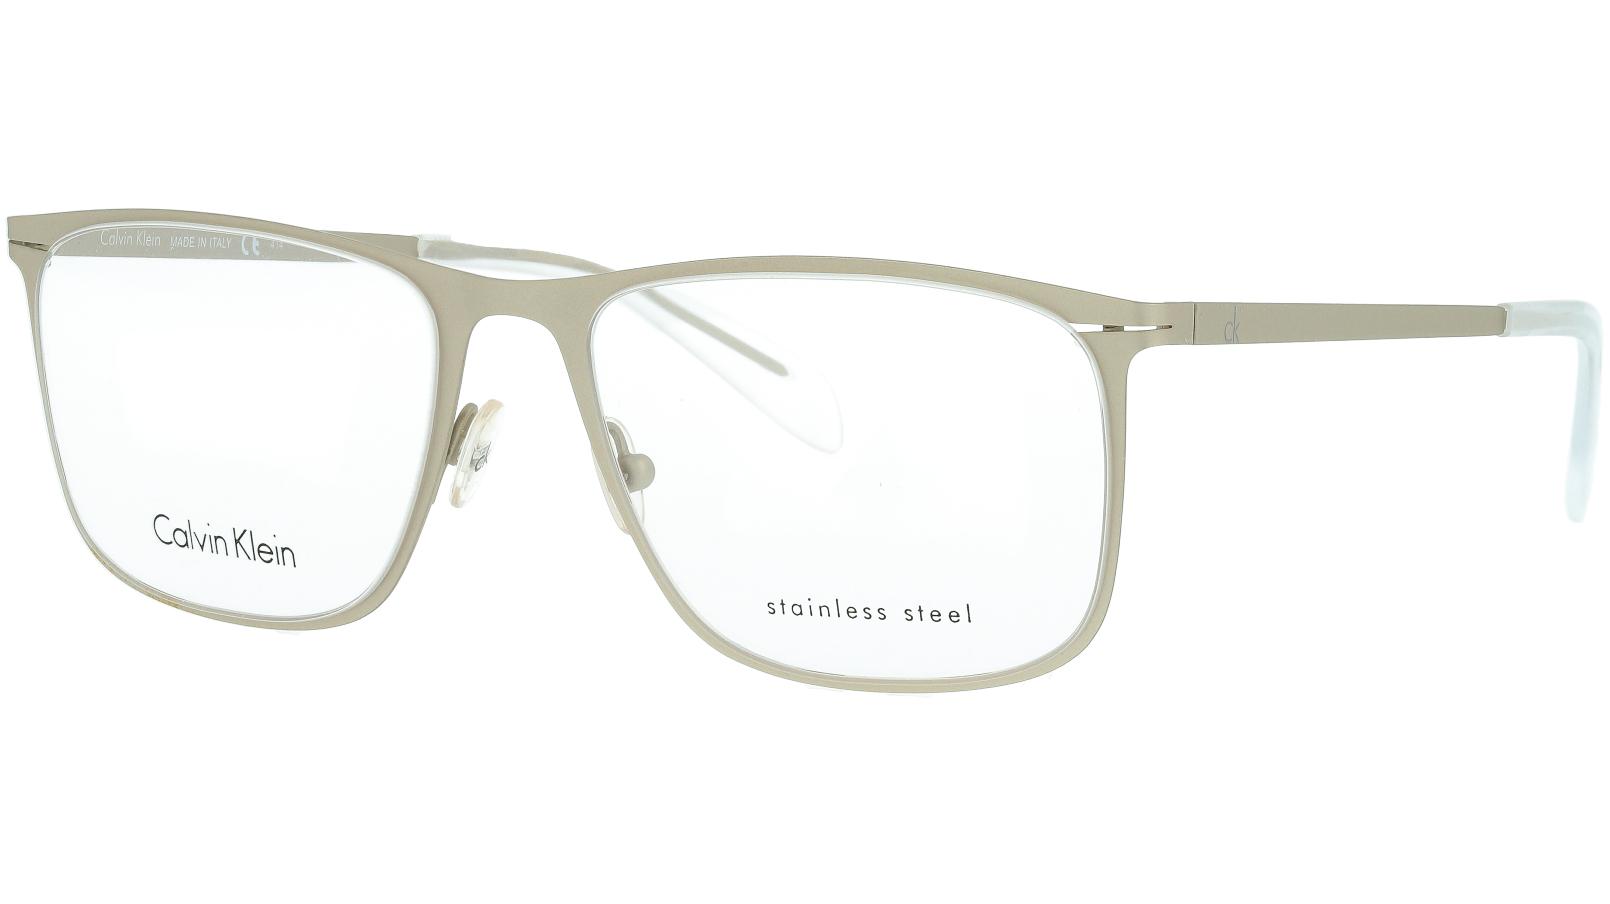 Calvin Klein CK5410 028 53 Silver Glasses